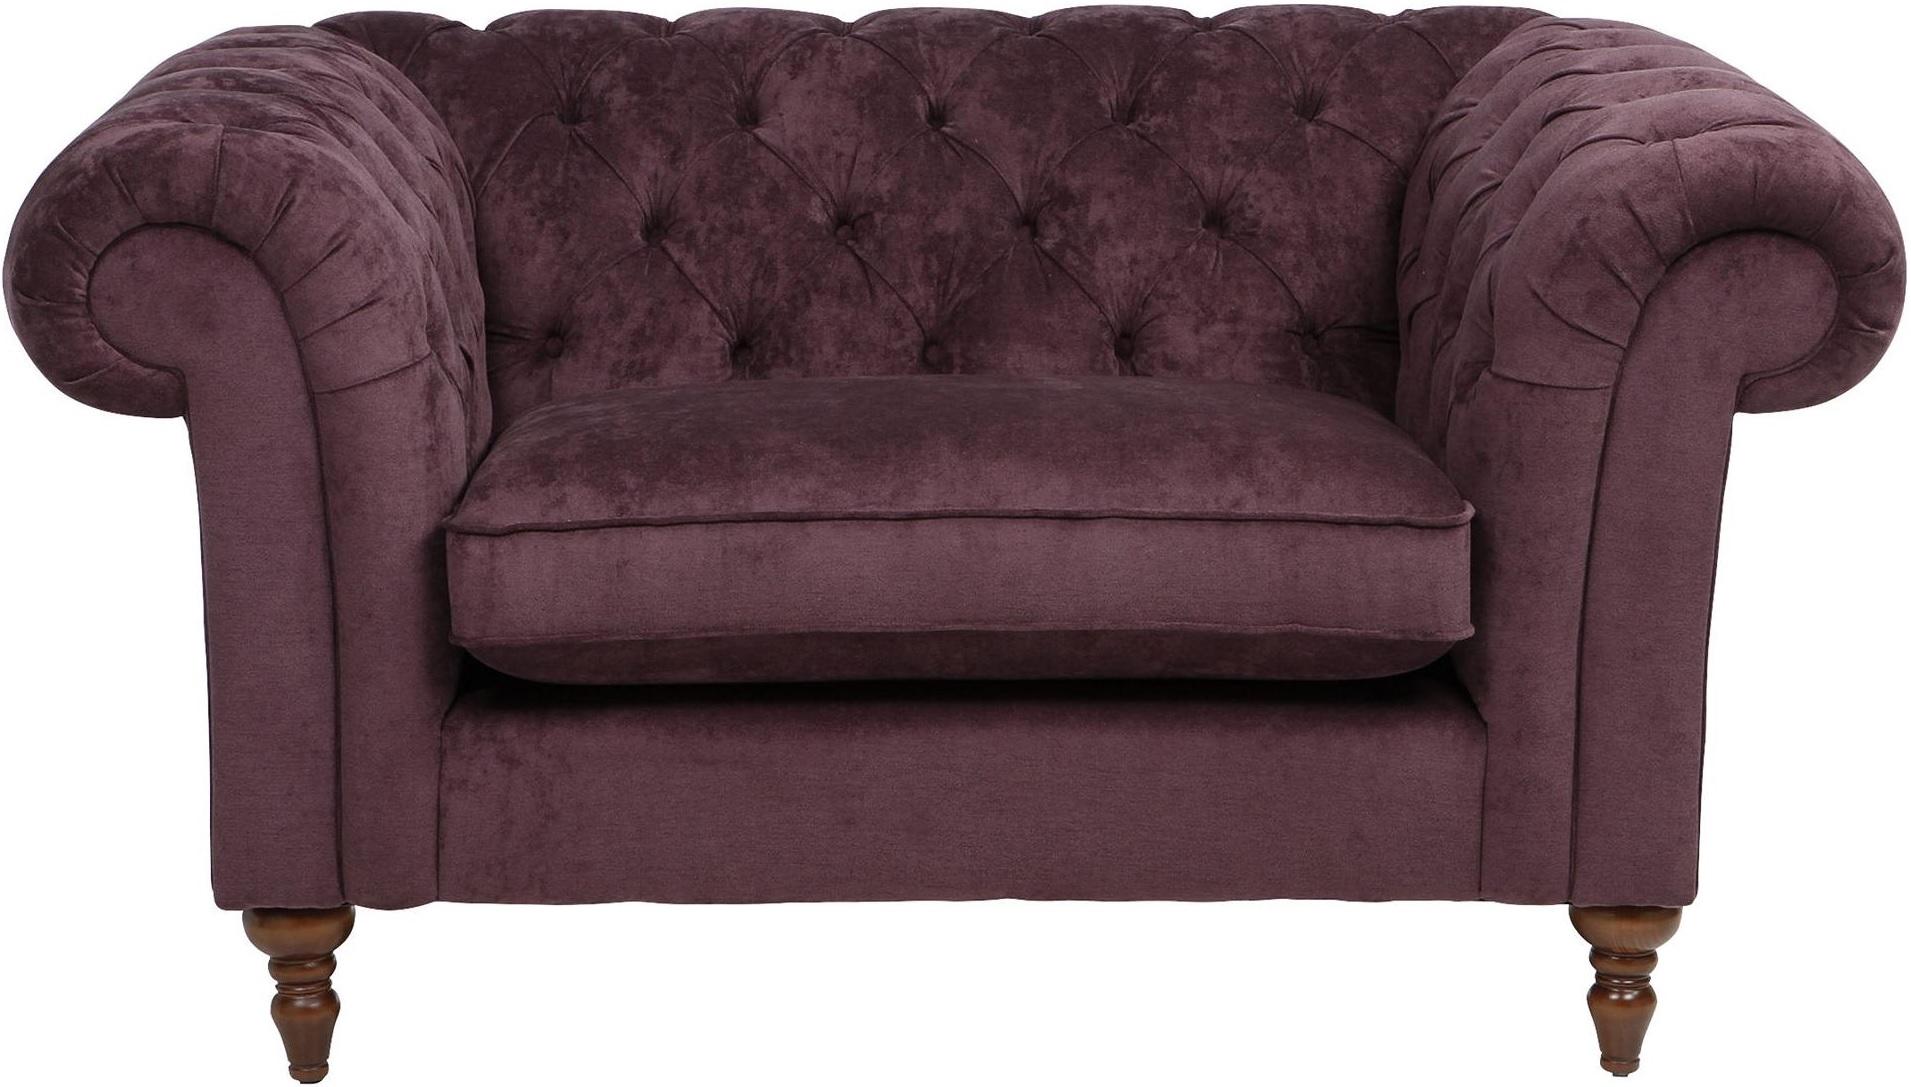 plum sofas uk wooden sofa sets online bangalore chesterfield luxurious velvet fabric loveseat 1 5 seat